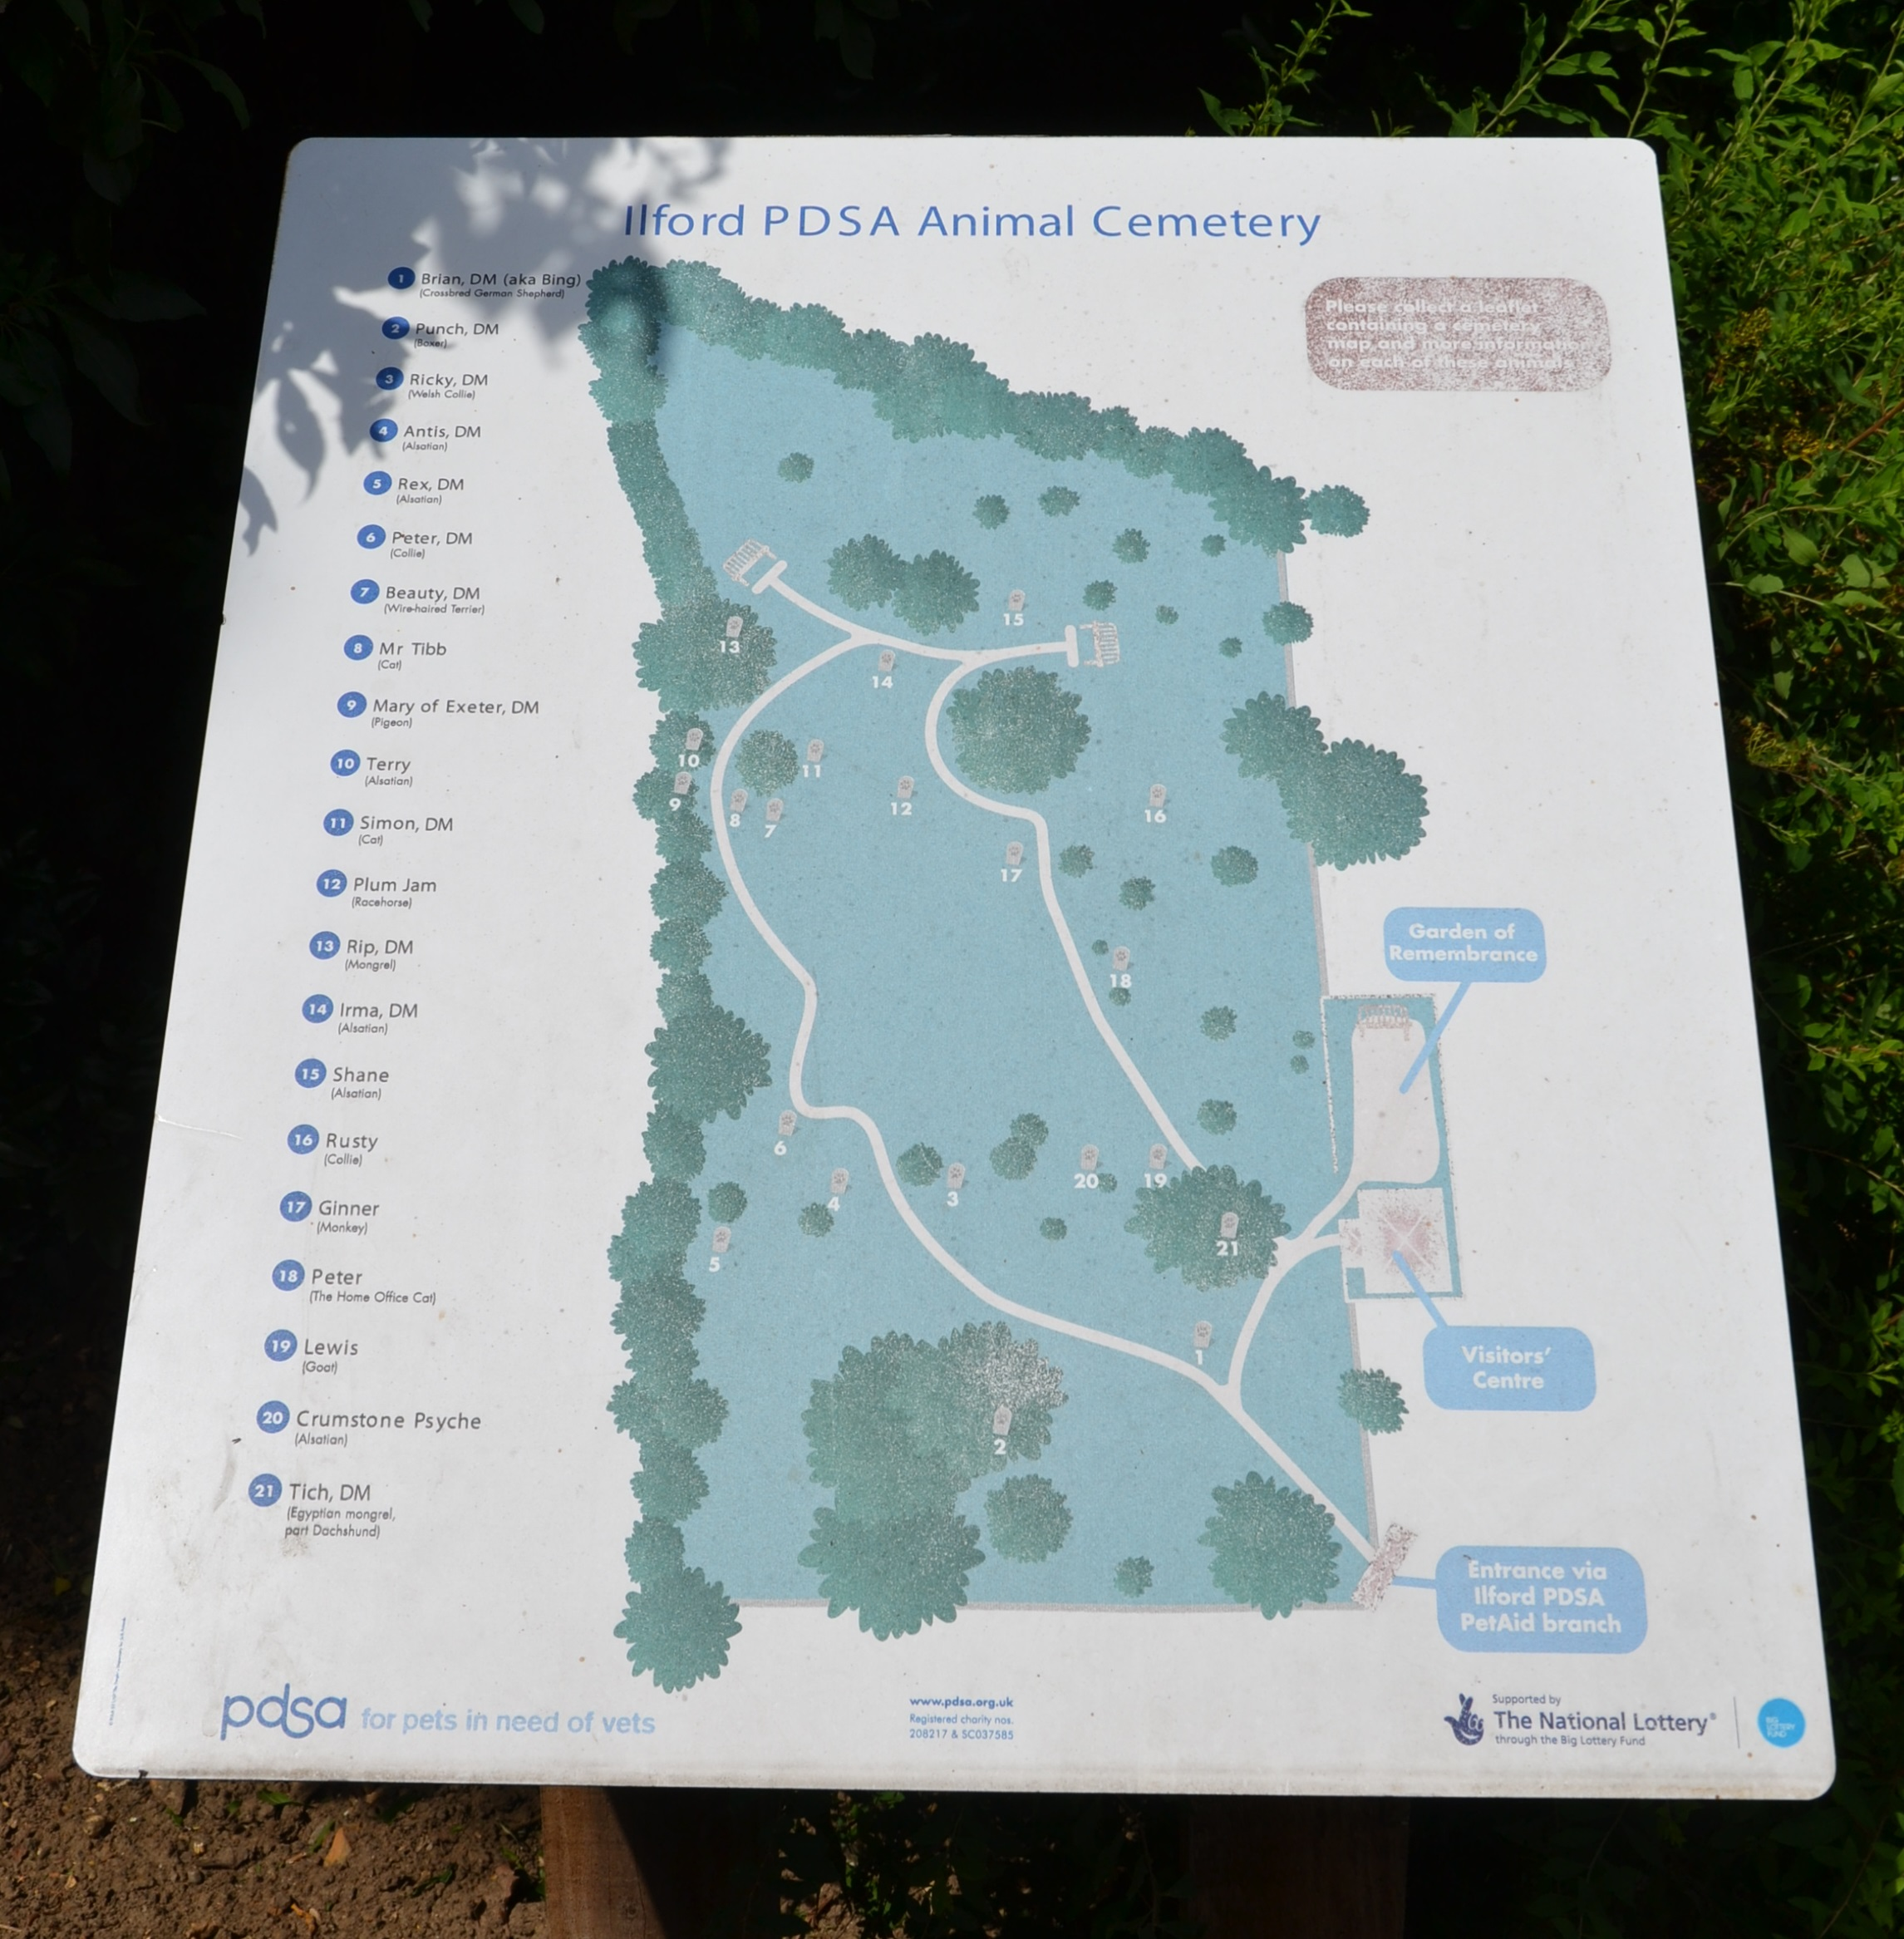 Ilford Animal Cemetery